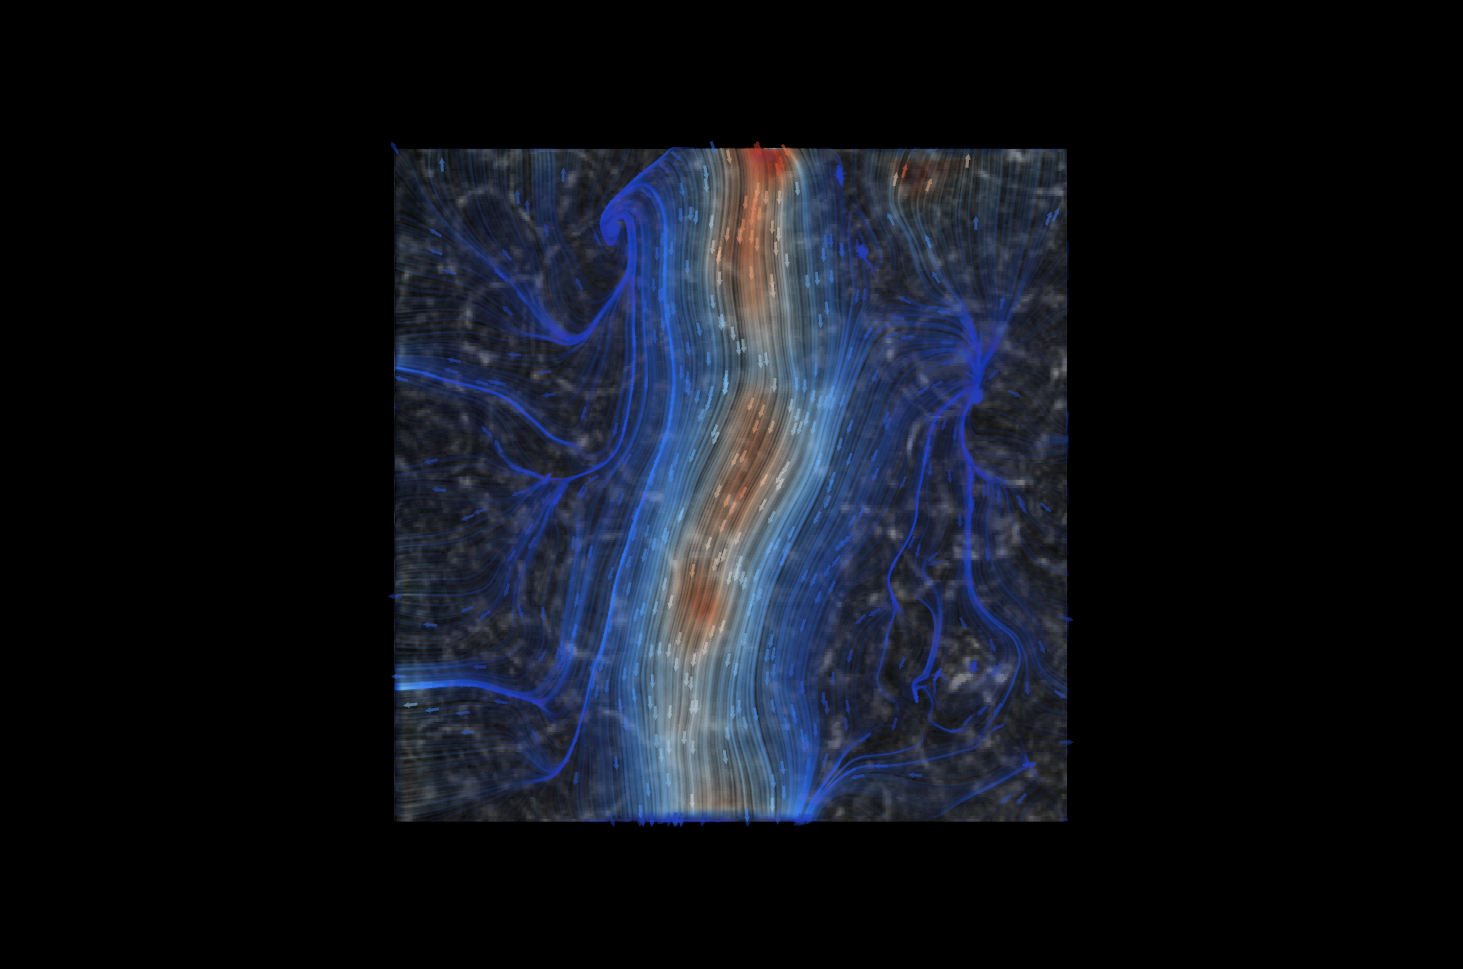 Cilia-driven mucus flow visualization by David Borland